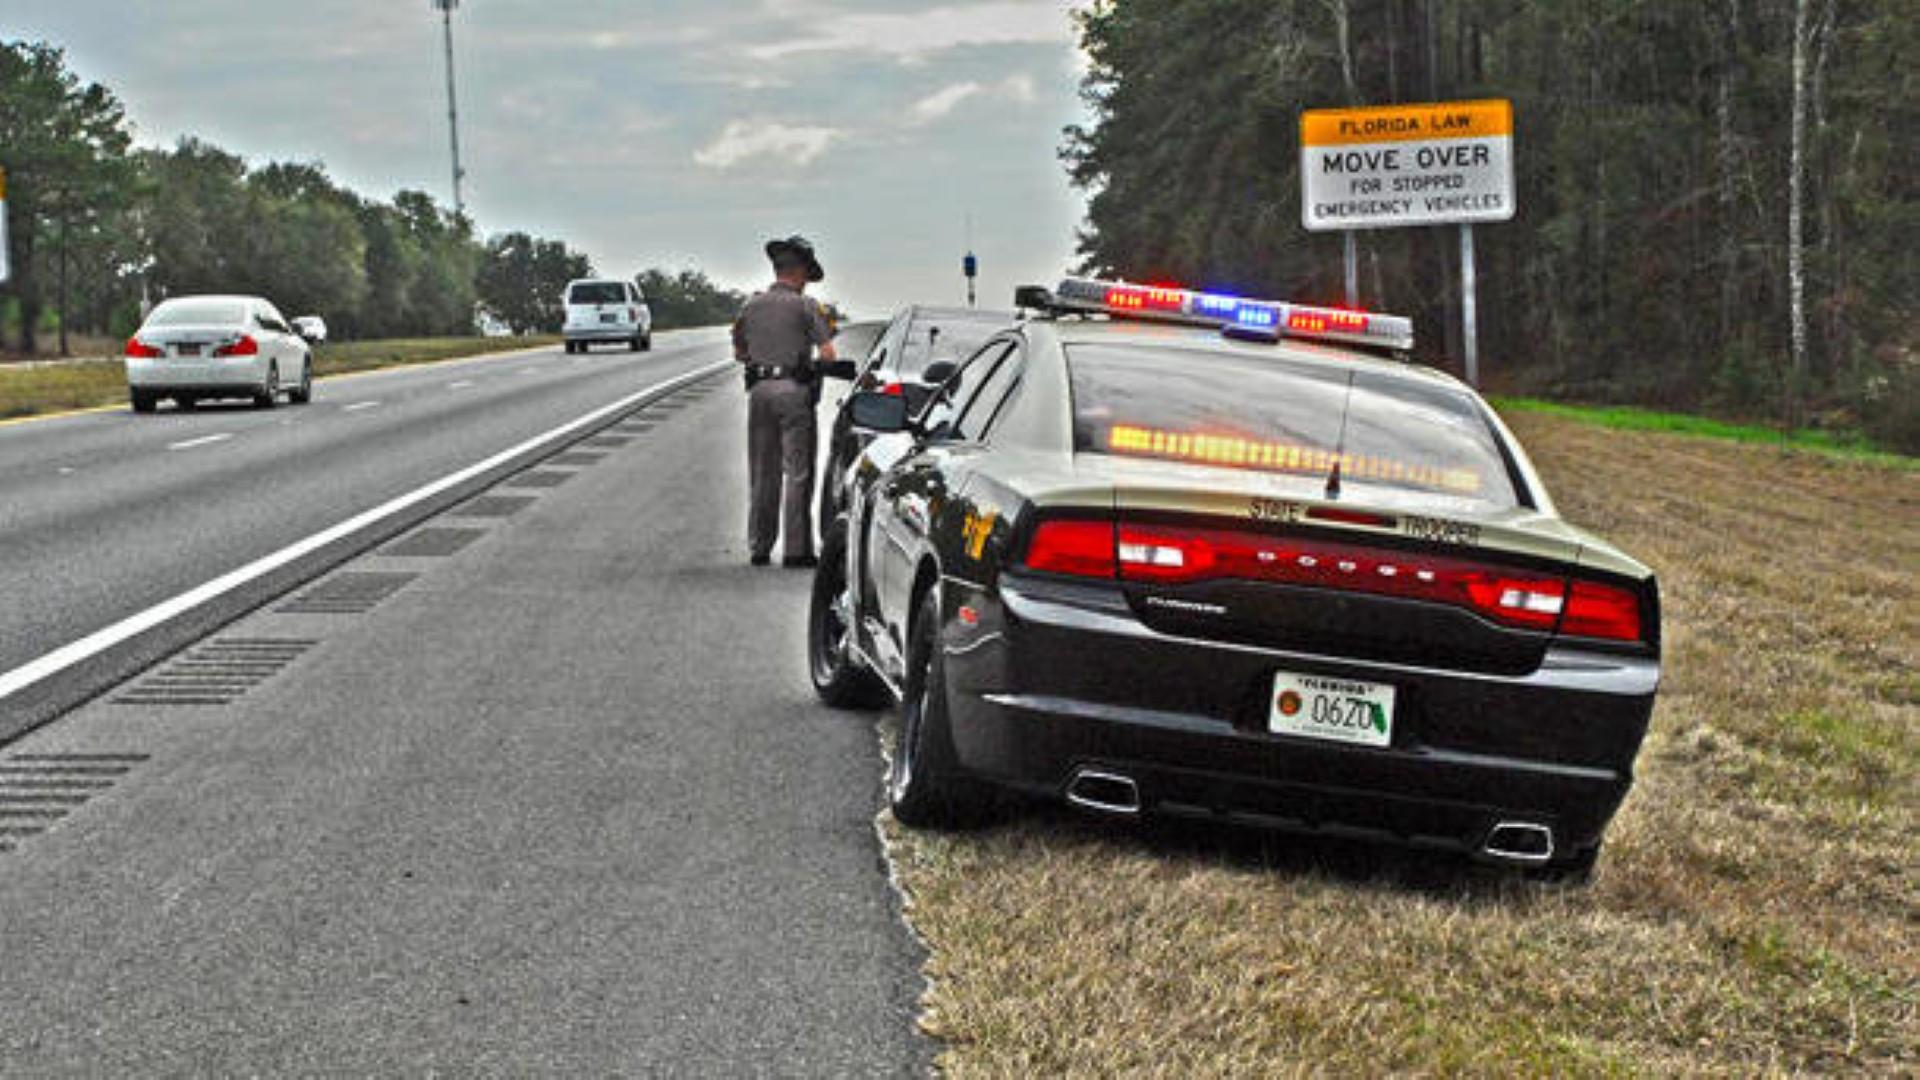 Florida Highway Patrol Traffic >> Ticketed Another Florida Highway Patrol Official Resigns